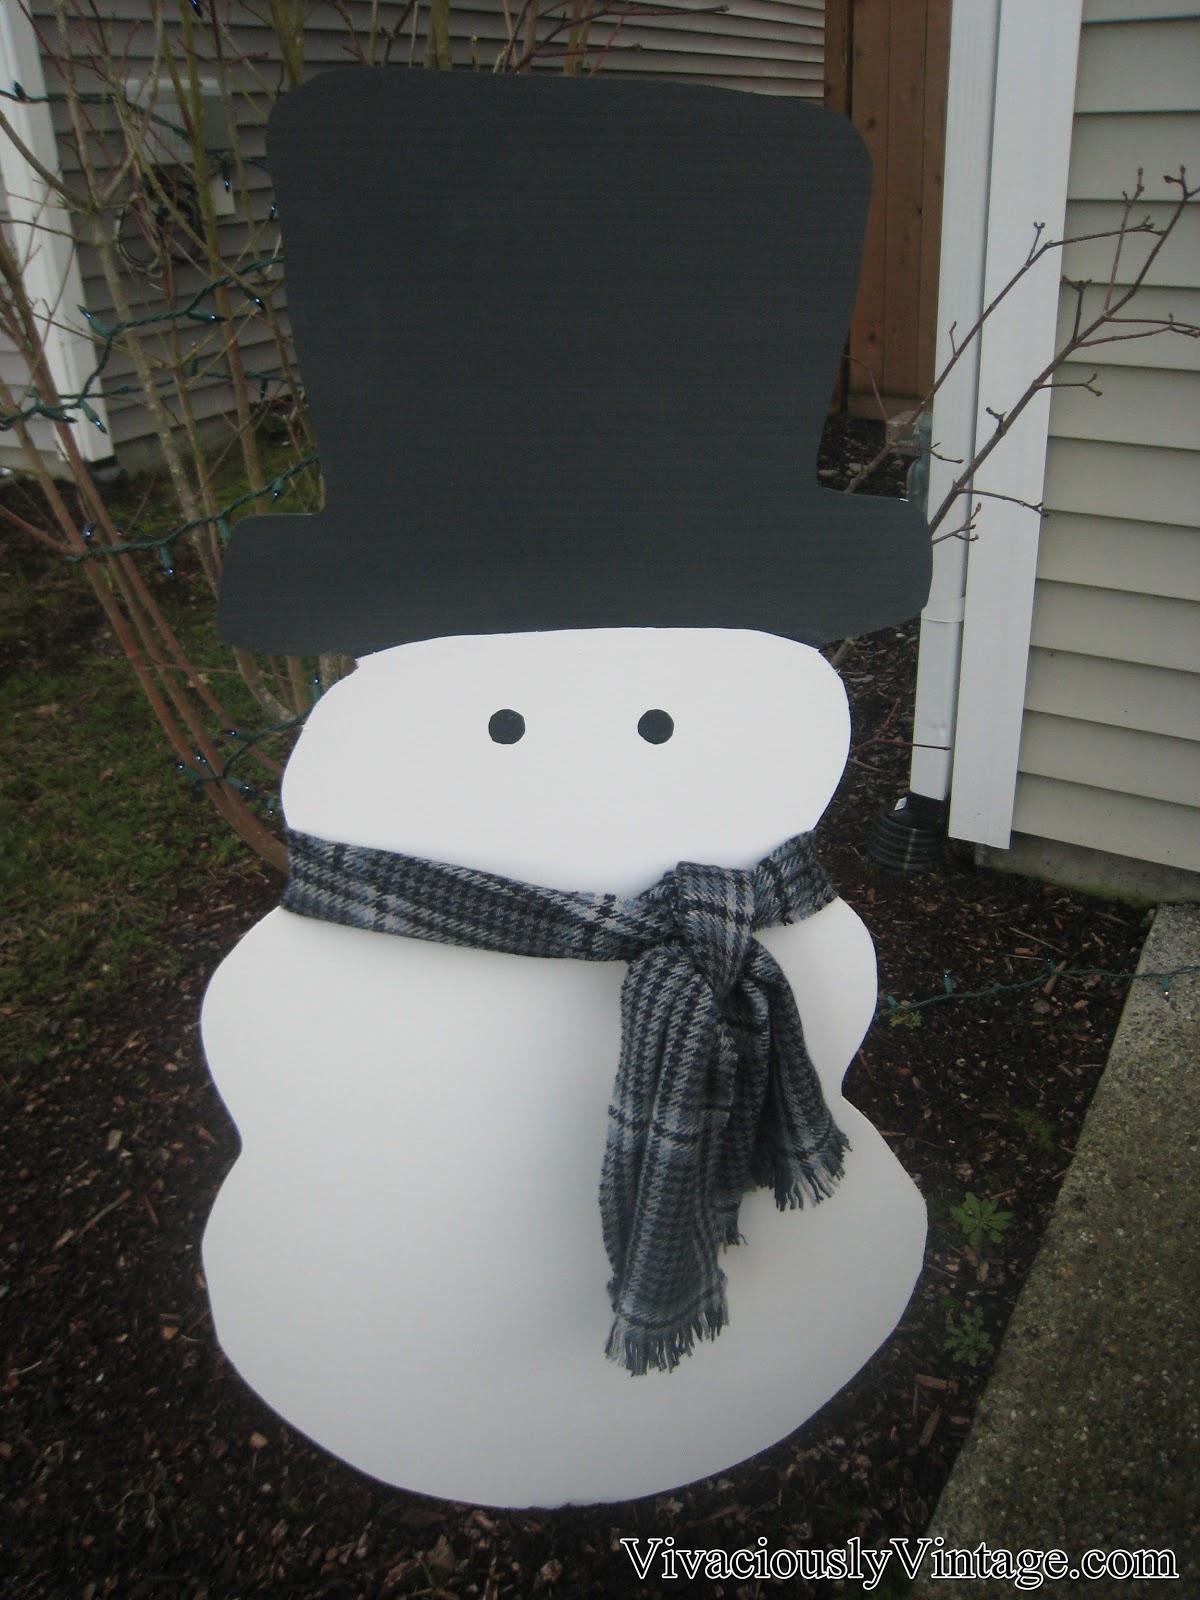 Ansley designs diy snowman yard decoration for Snowman decorations